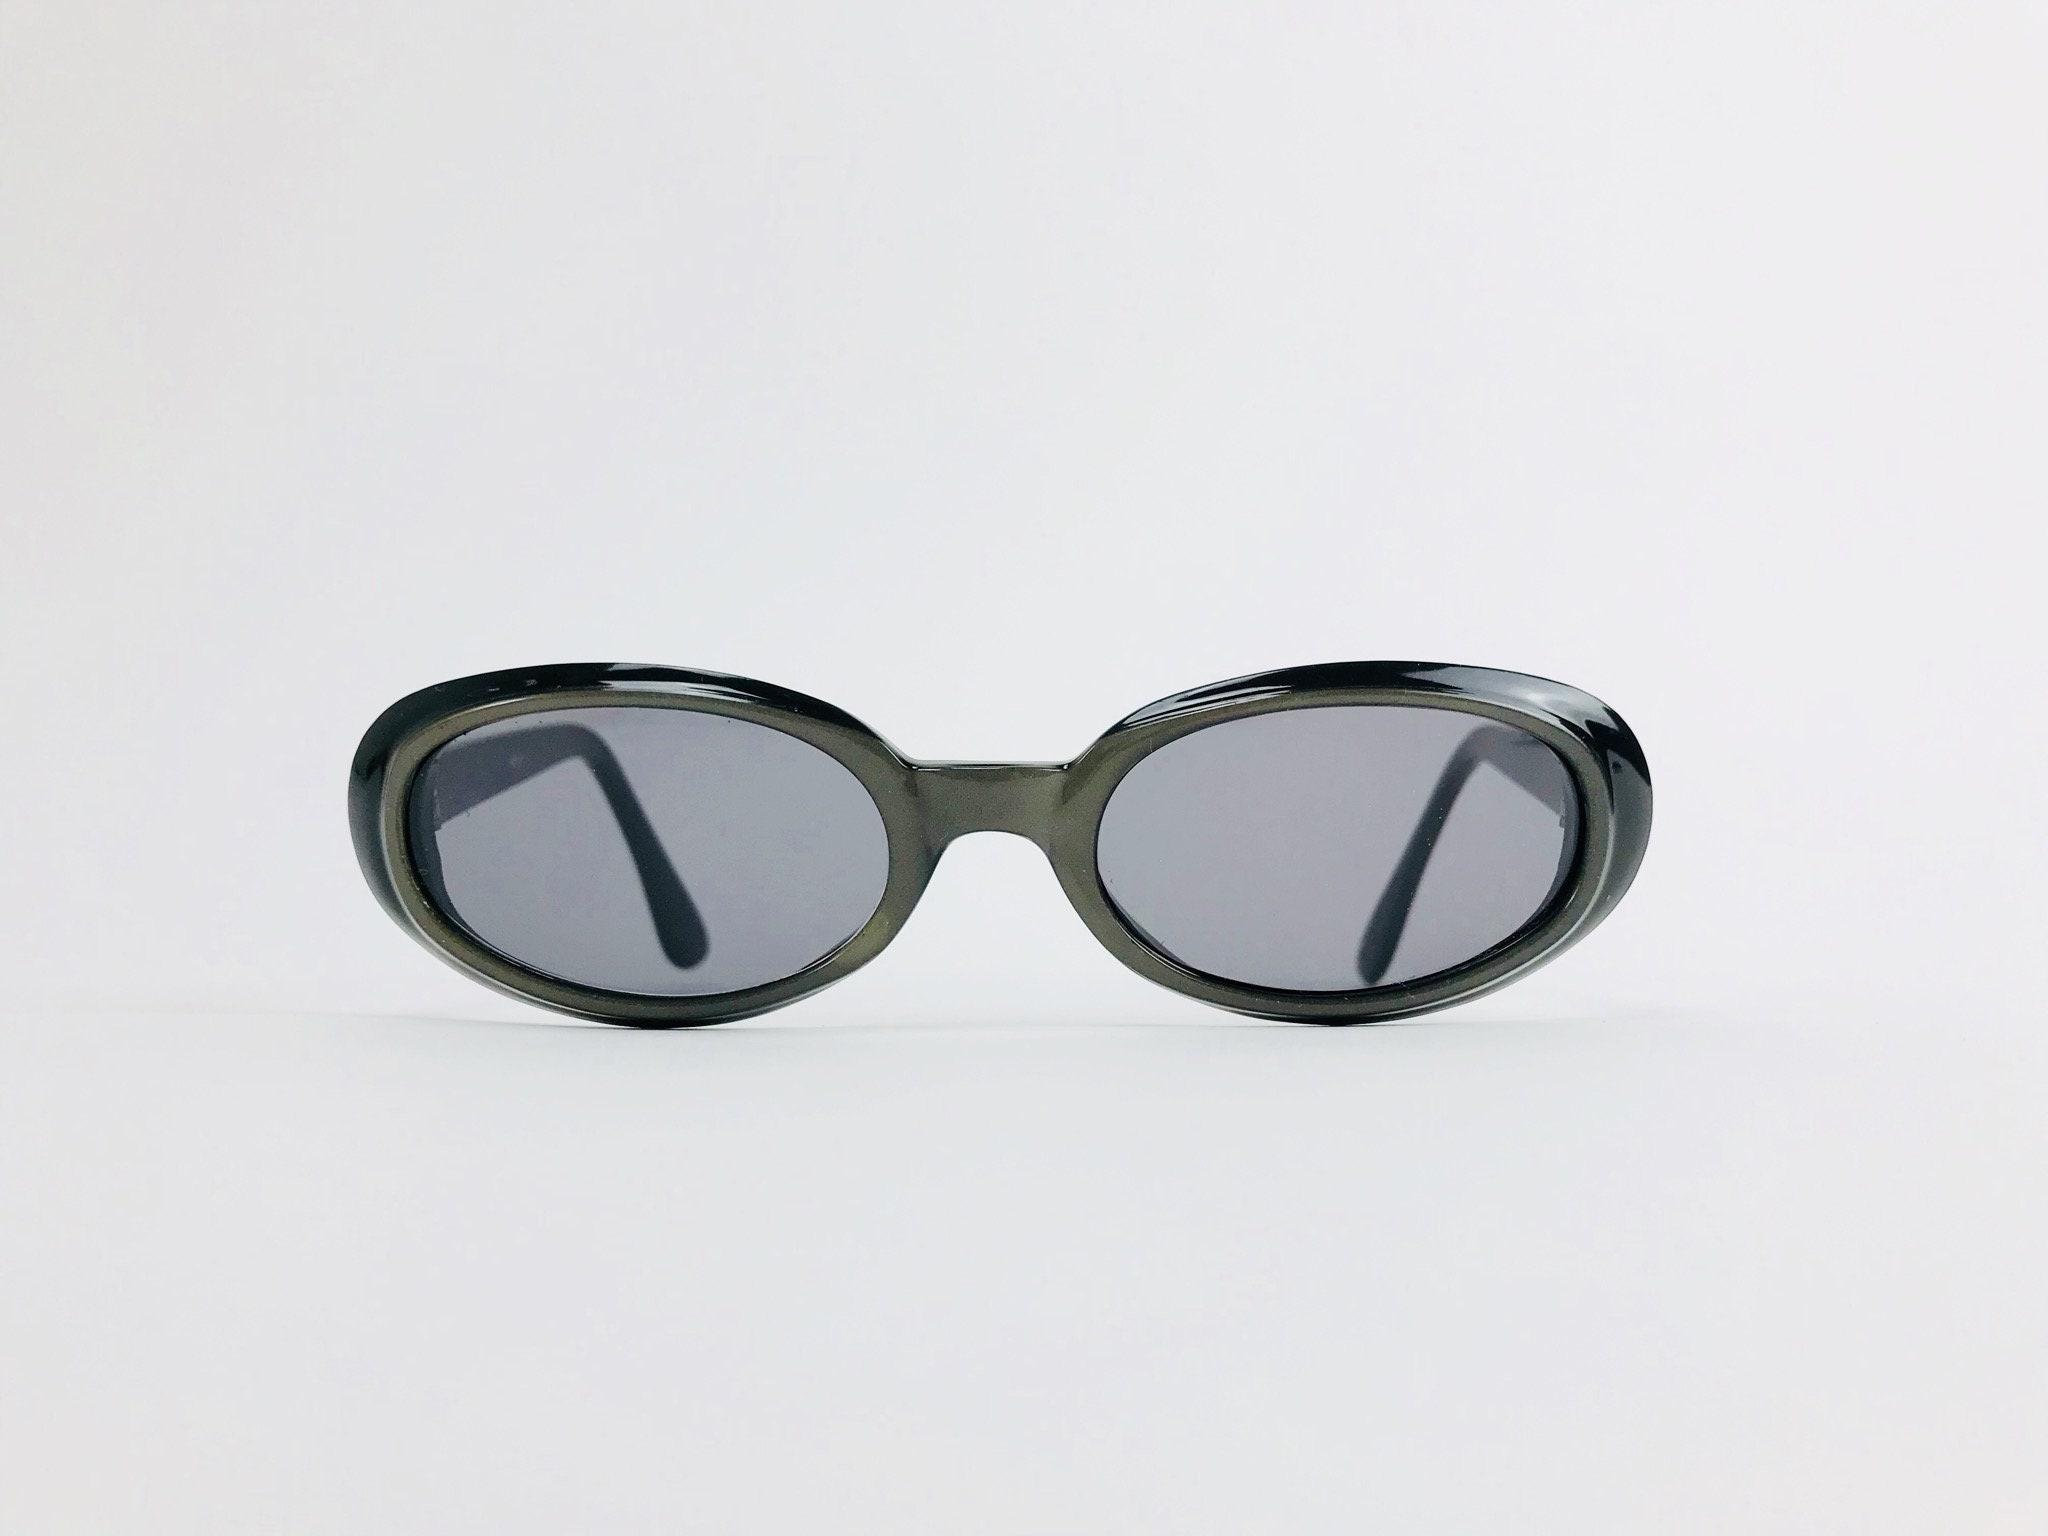 d44c571fa92 Slim vintage sunglasses fashion trend Glasses